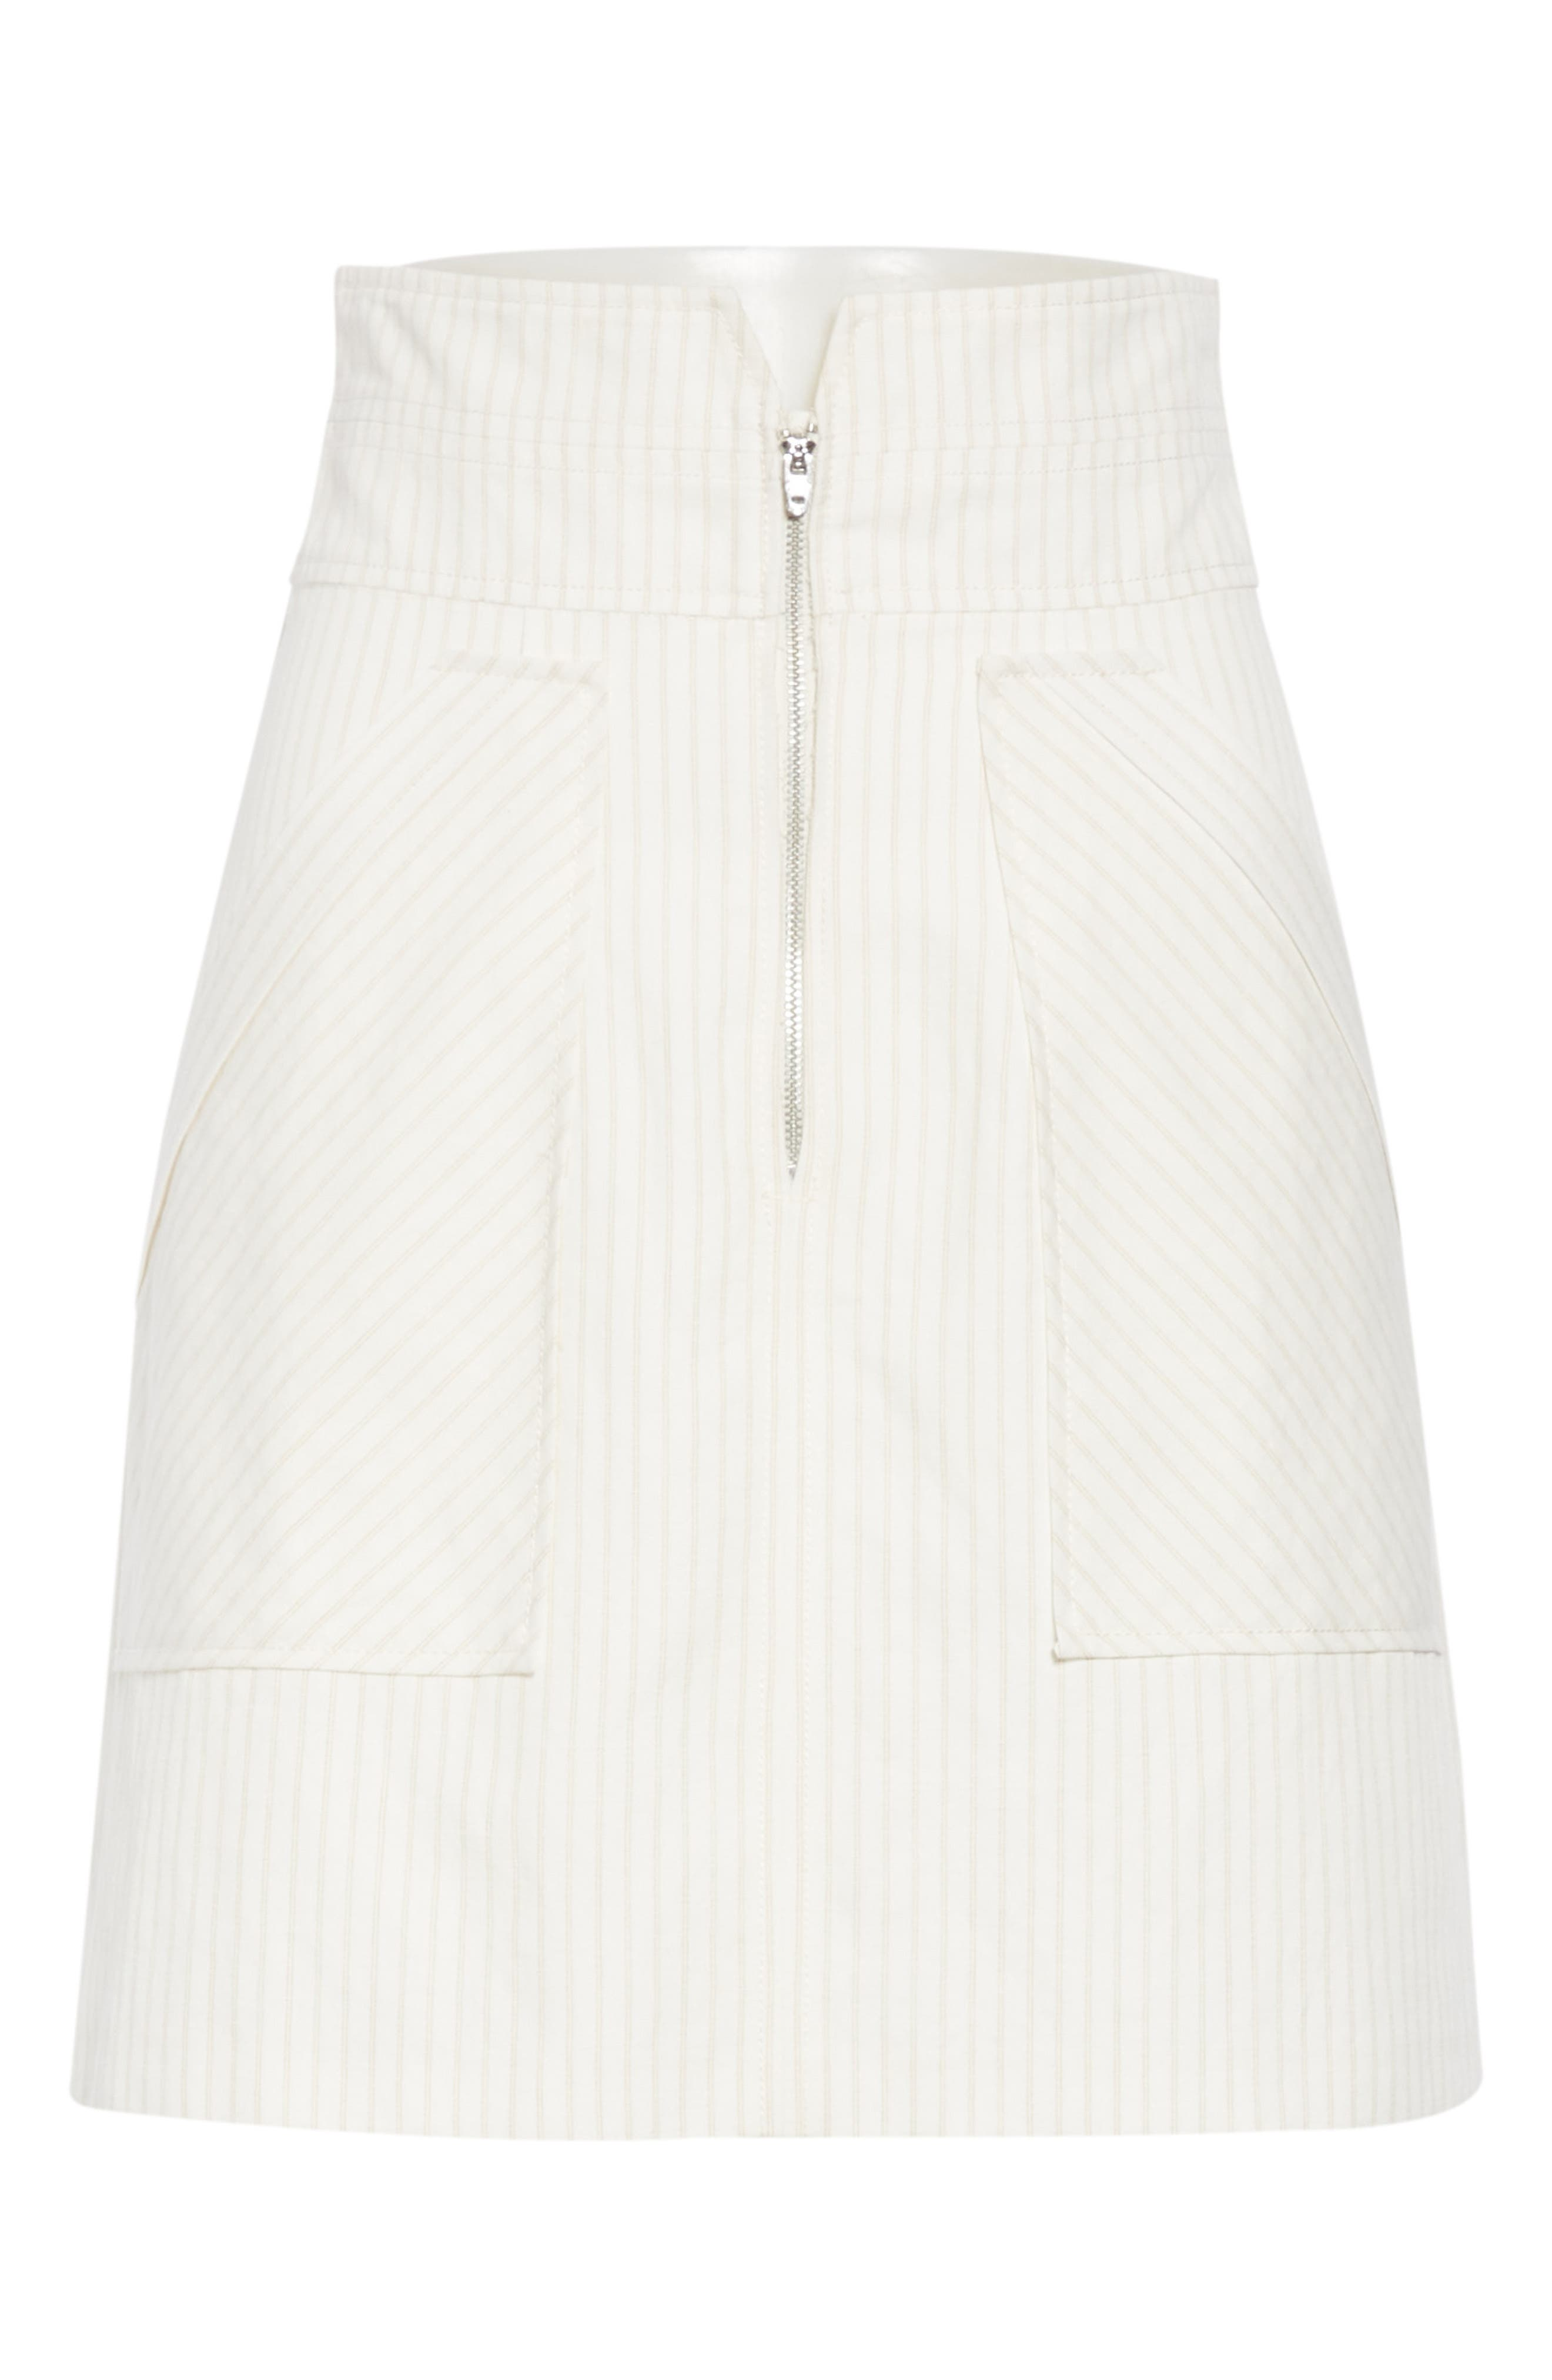 REBECCA TAYLOR, Zip Front Pinstripe Cotton & Linen Skirt, Alternate thumbnail 6, color, SNOW COMBO